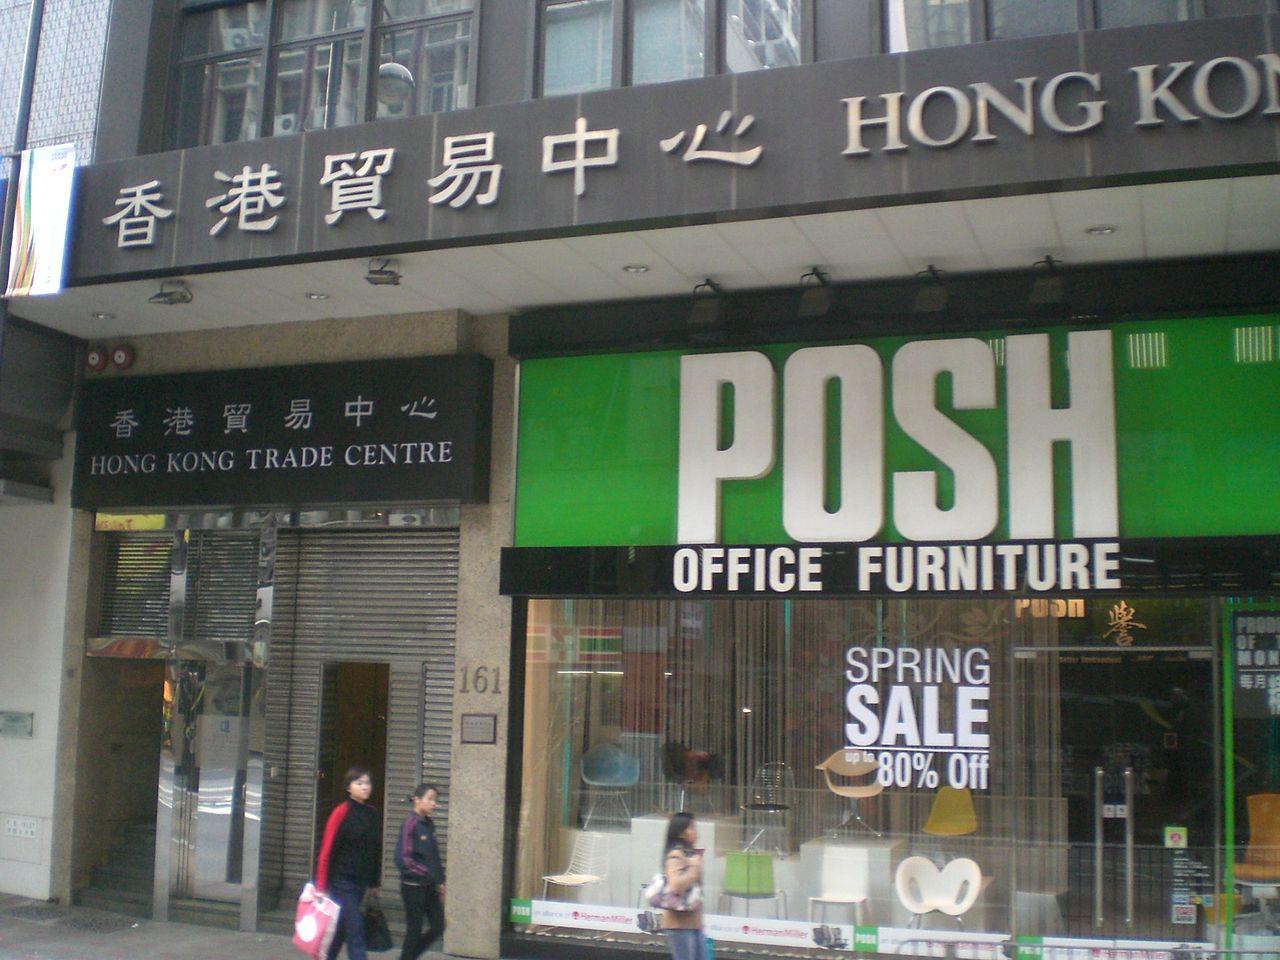 posh office furniture. File:HK Des Voeux Road Central 161 Hong Kong Trade Centre POSH Office Furniture Shop.JPG Posh R